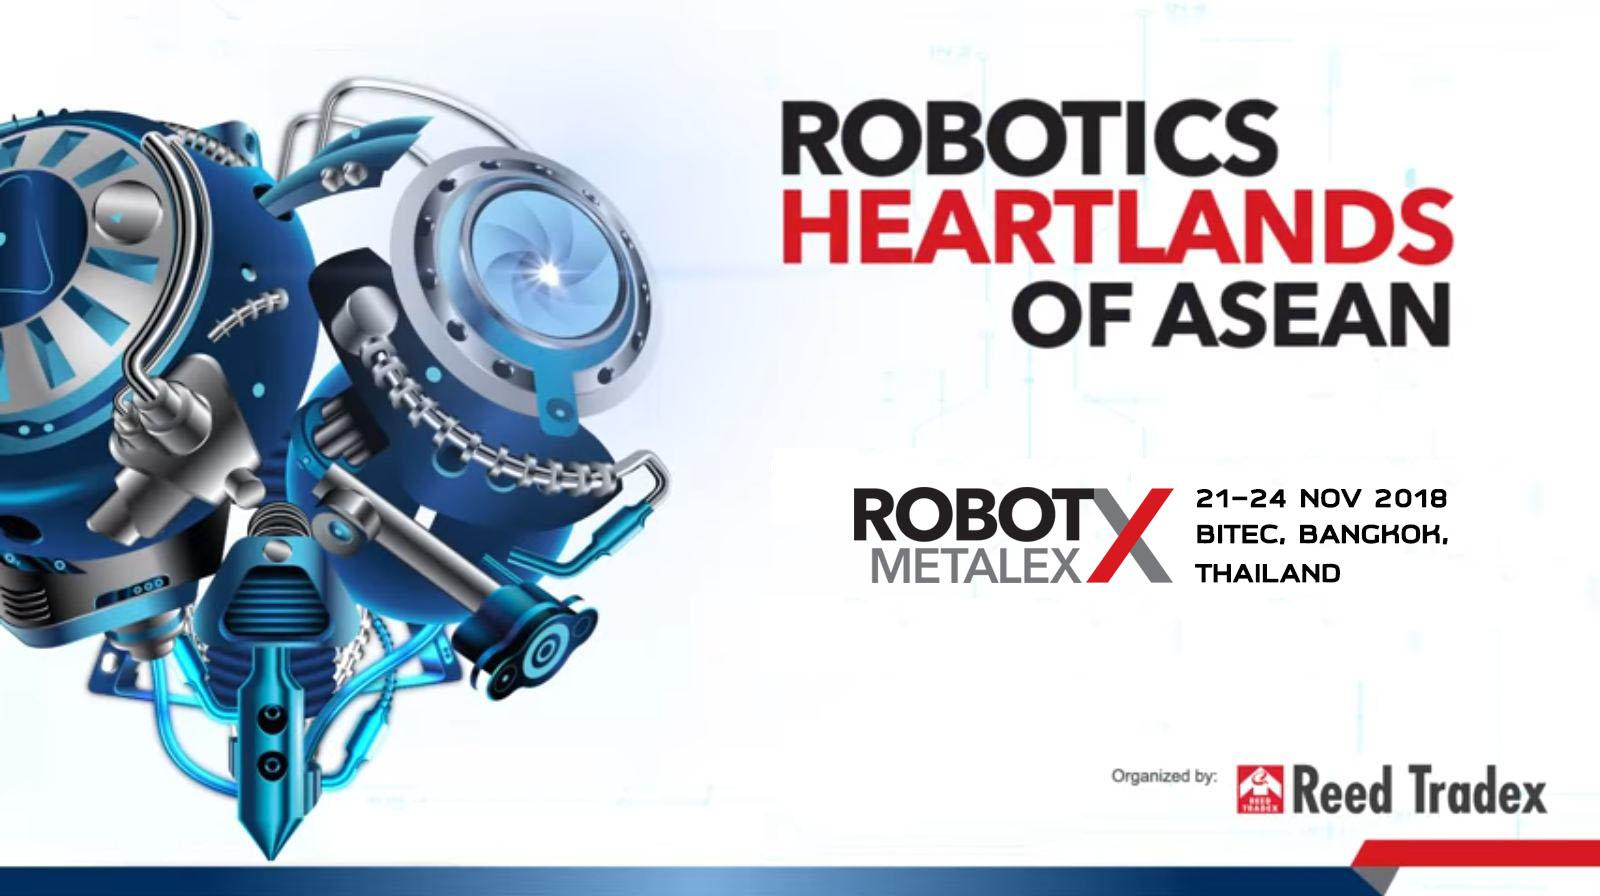 ROBOT X @METALEX 2018